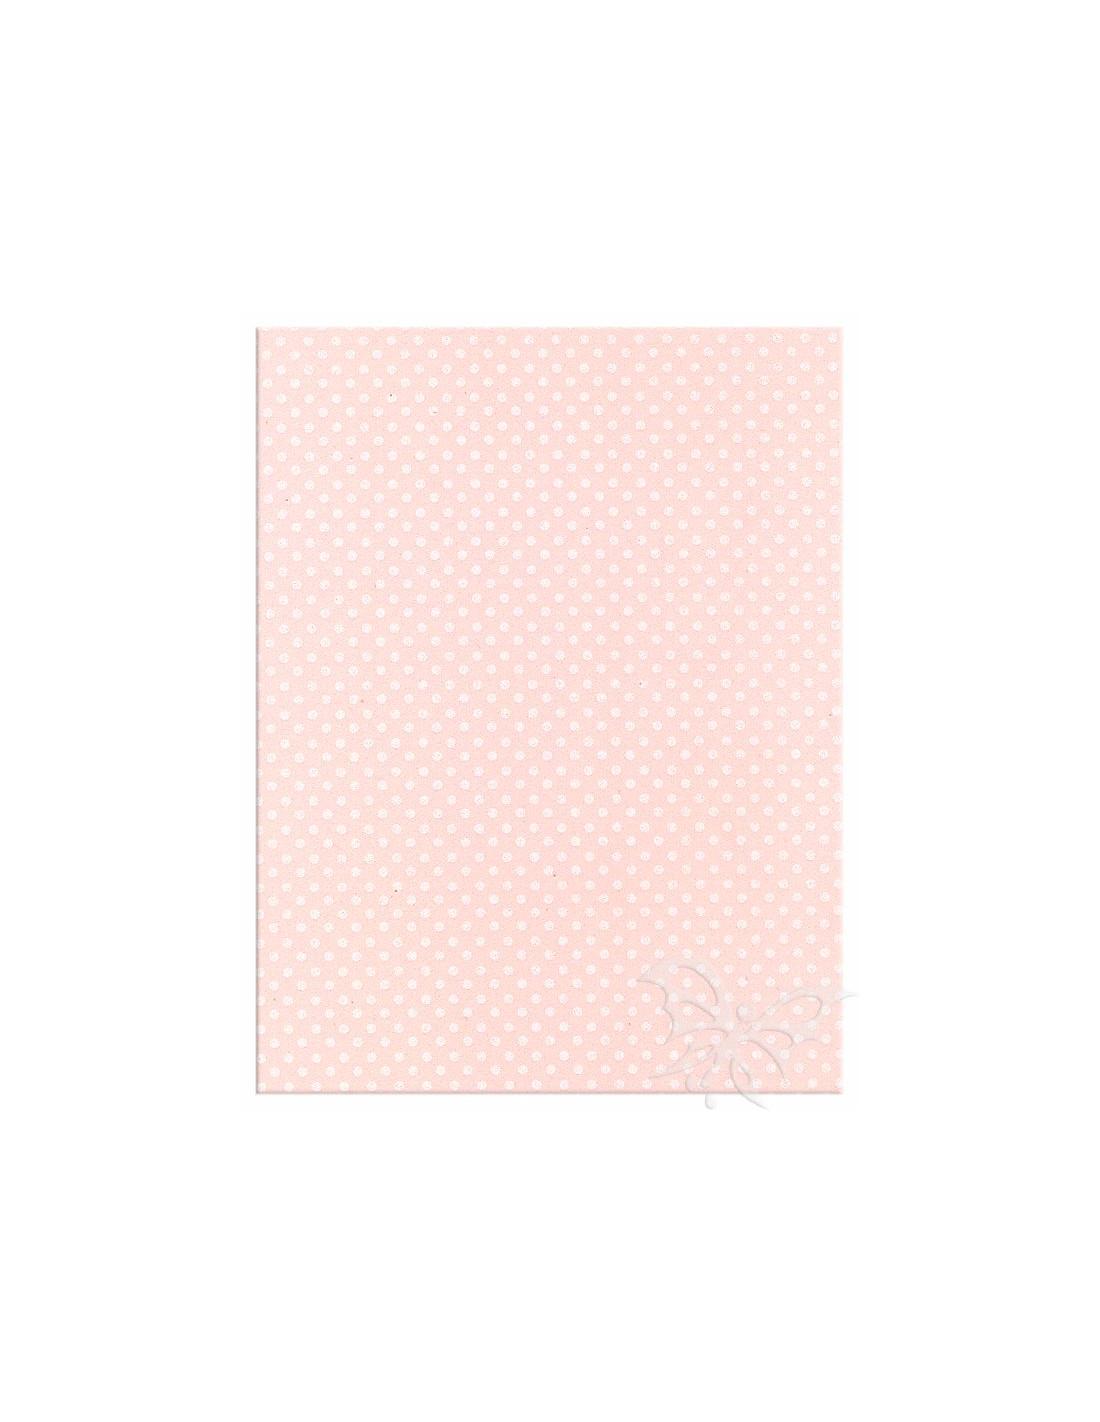 Foglio moosgummi pois rosa pastello bianco jpg 800x800 Moosgummi 40x60cm 96c61747274